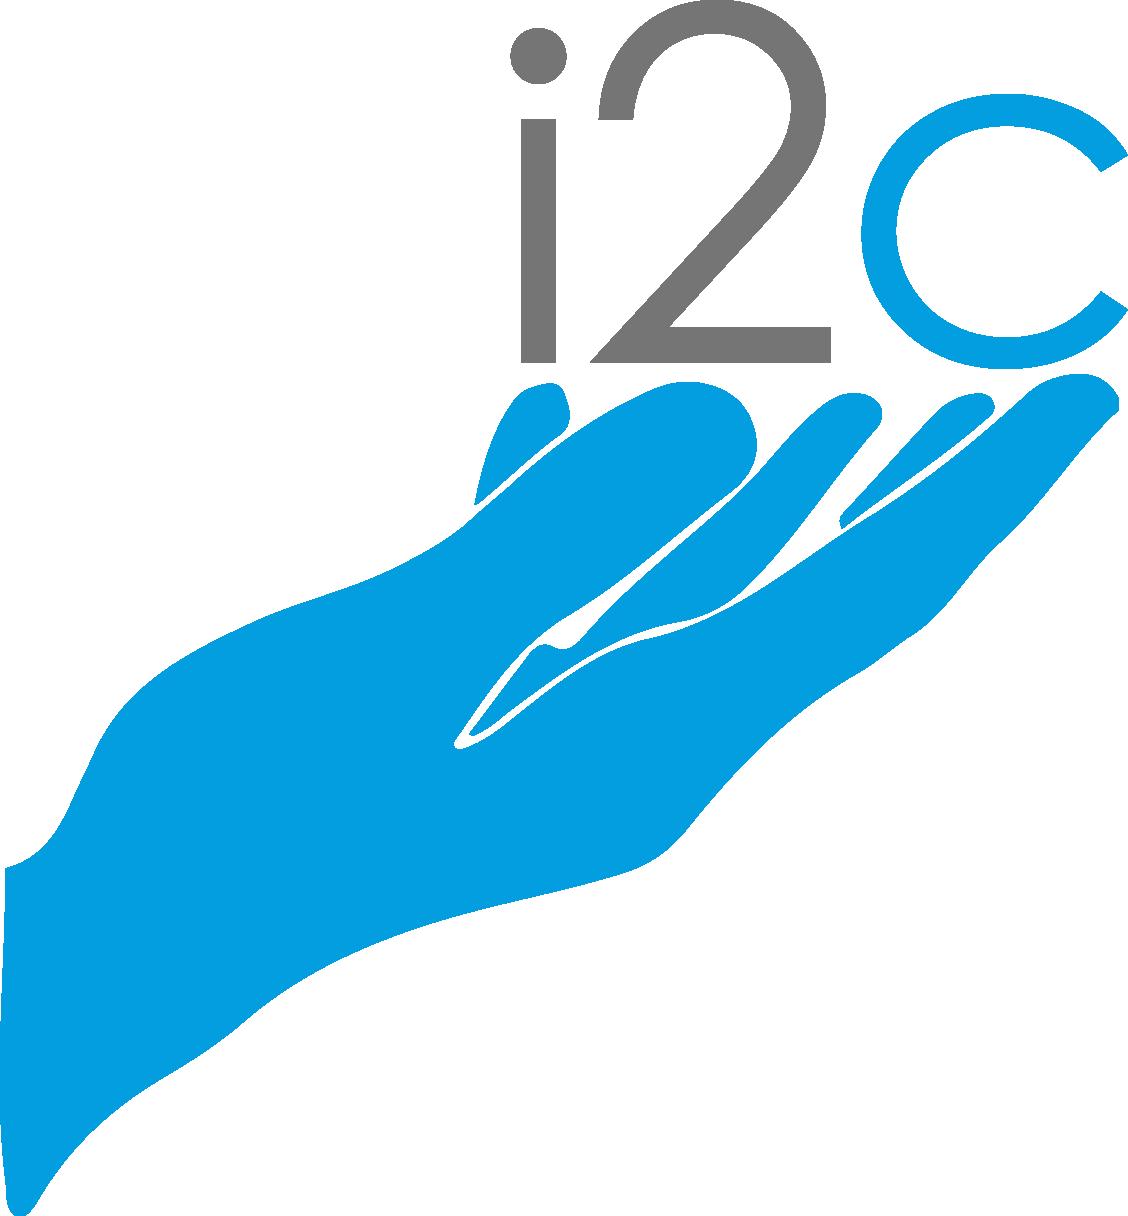 logo-i2c